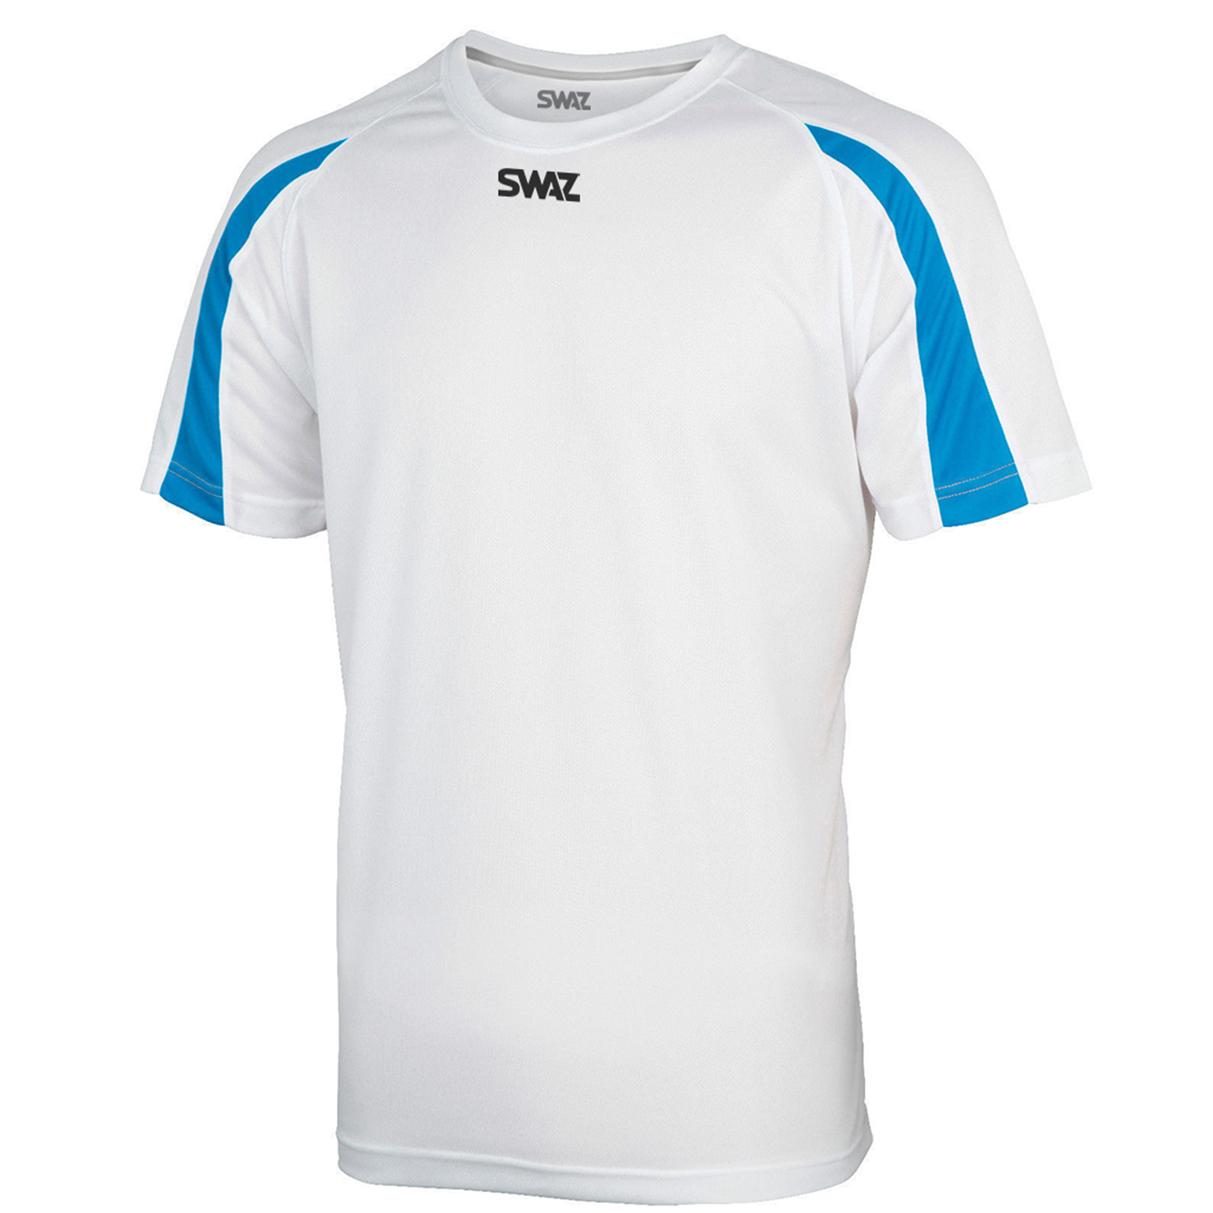 SWAZ Premier Training T-Shirt – White/Sapphire